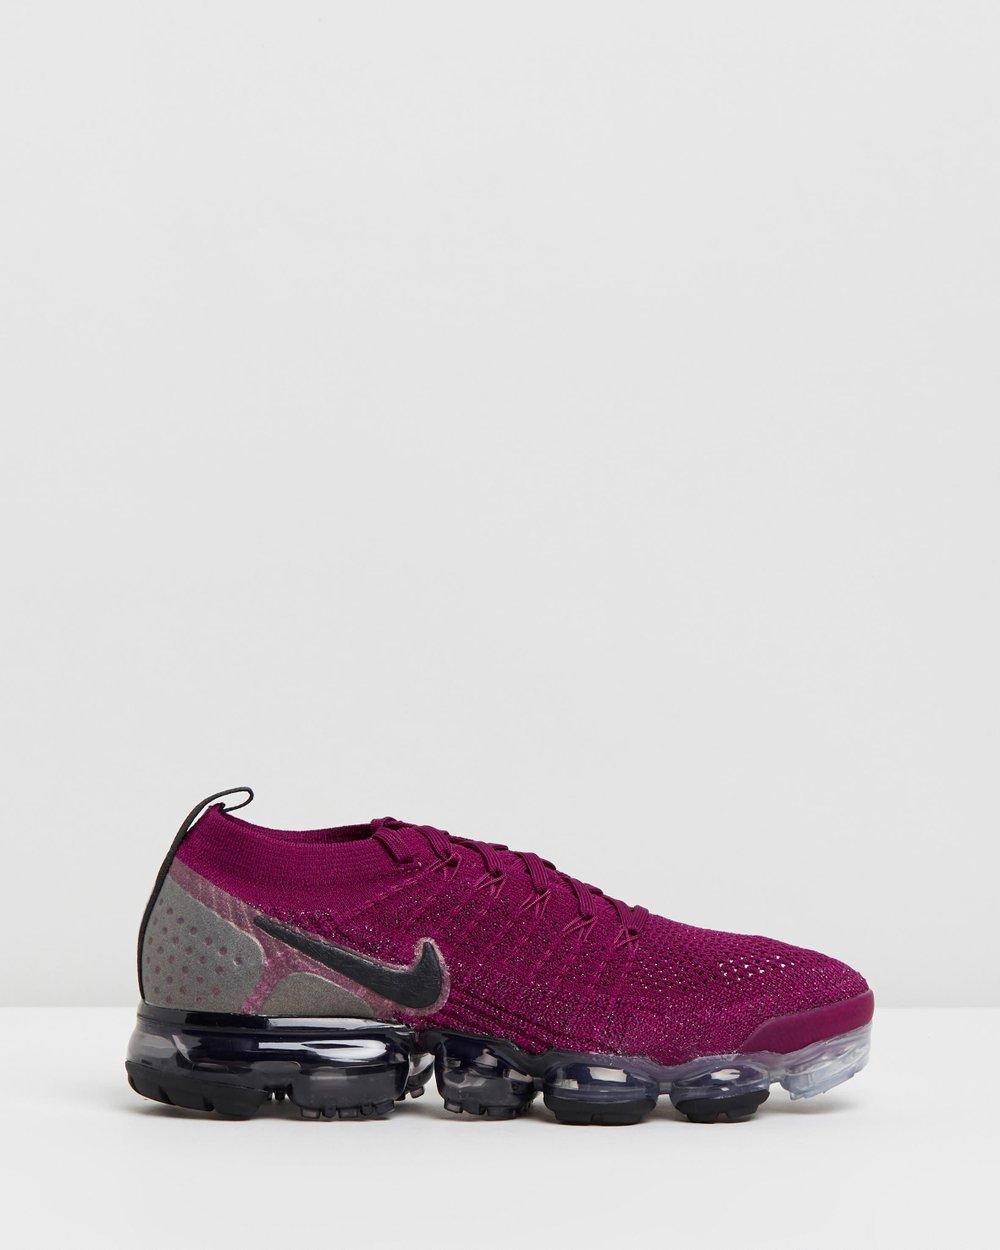 743a9dbc1a1 Air VaporMax Flyknit 2 - Women s by Nike Online